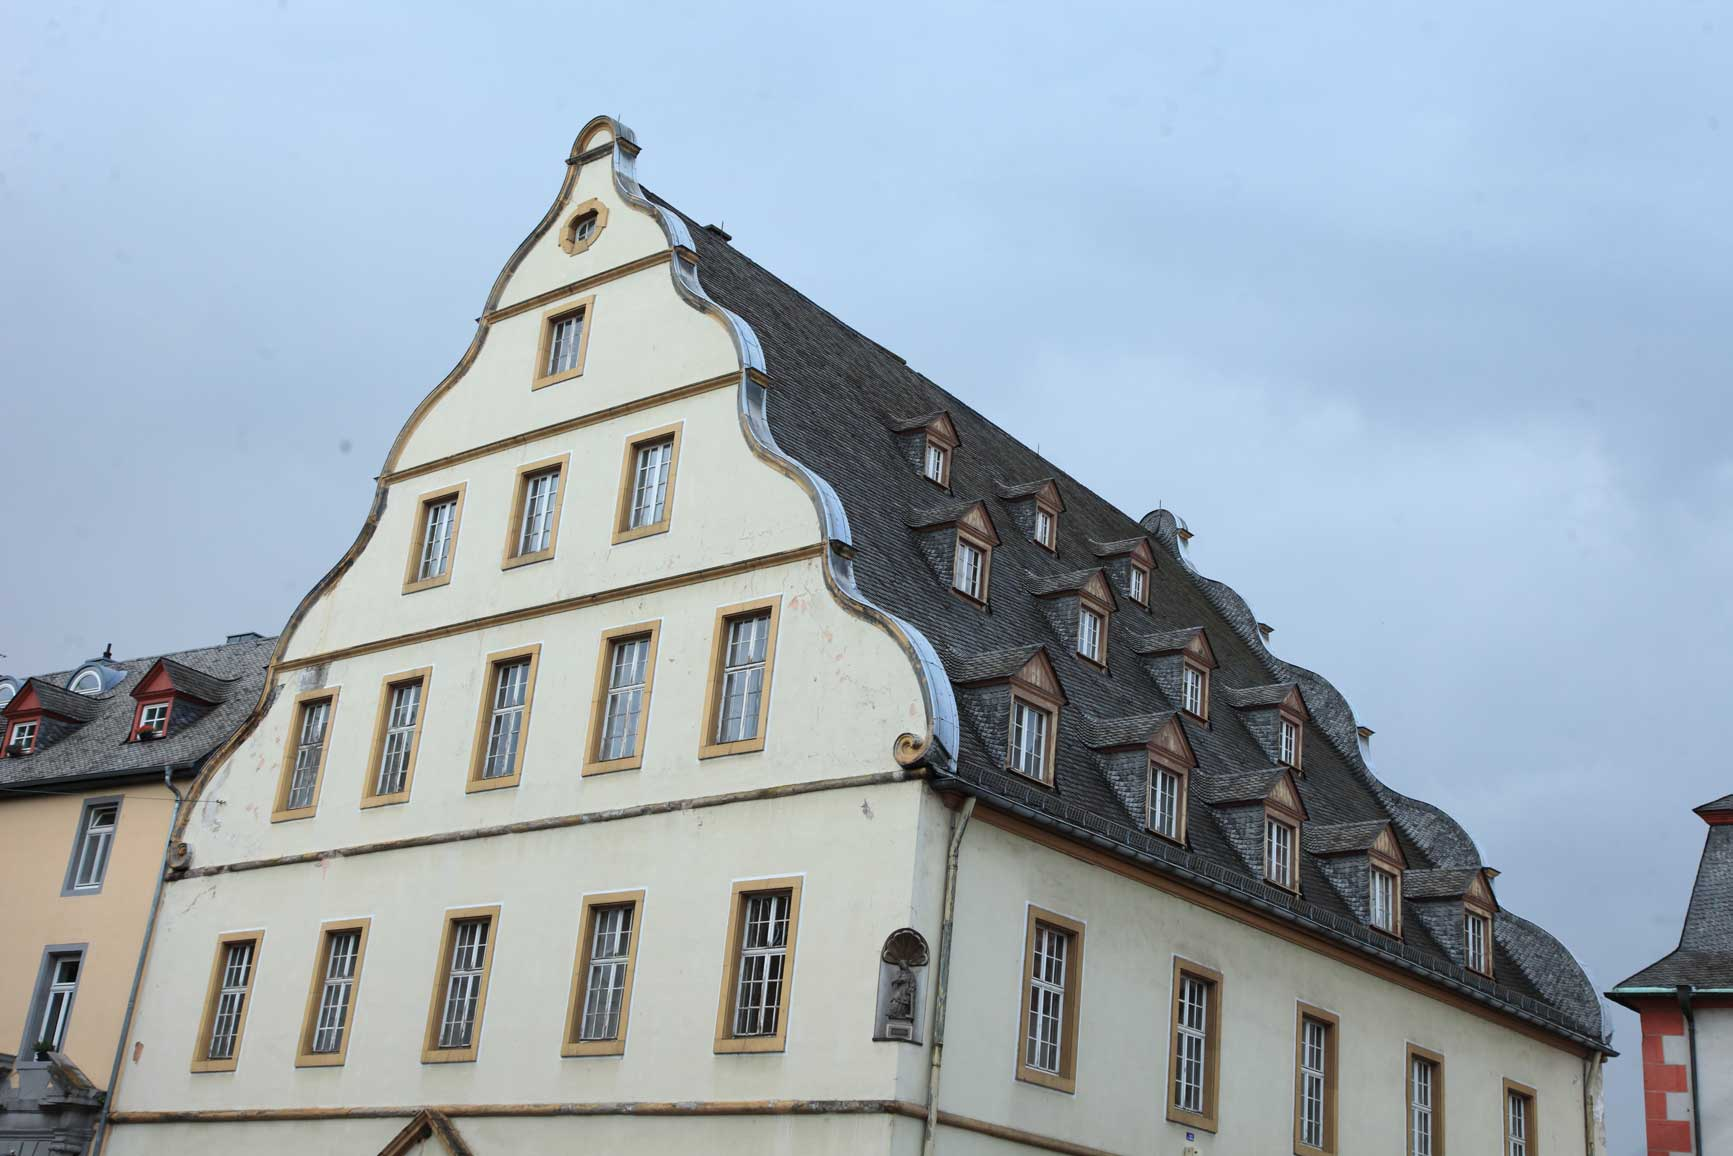 Rhine-15-08-14_21-15-12